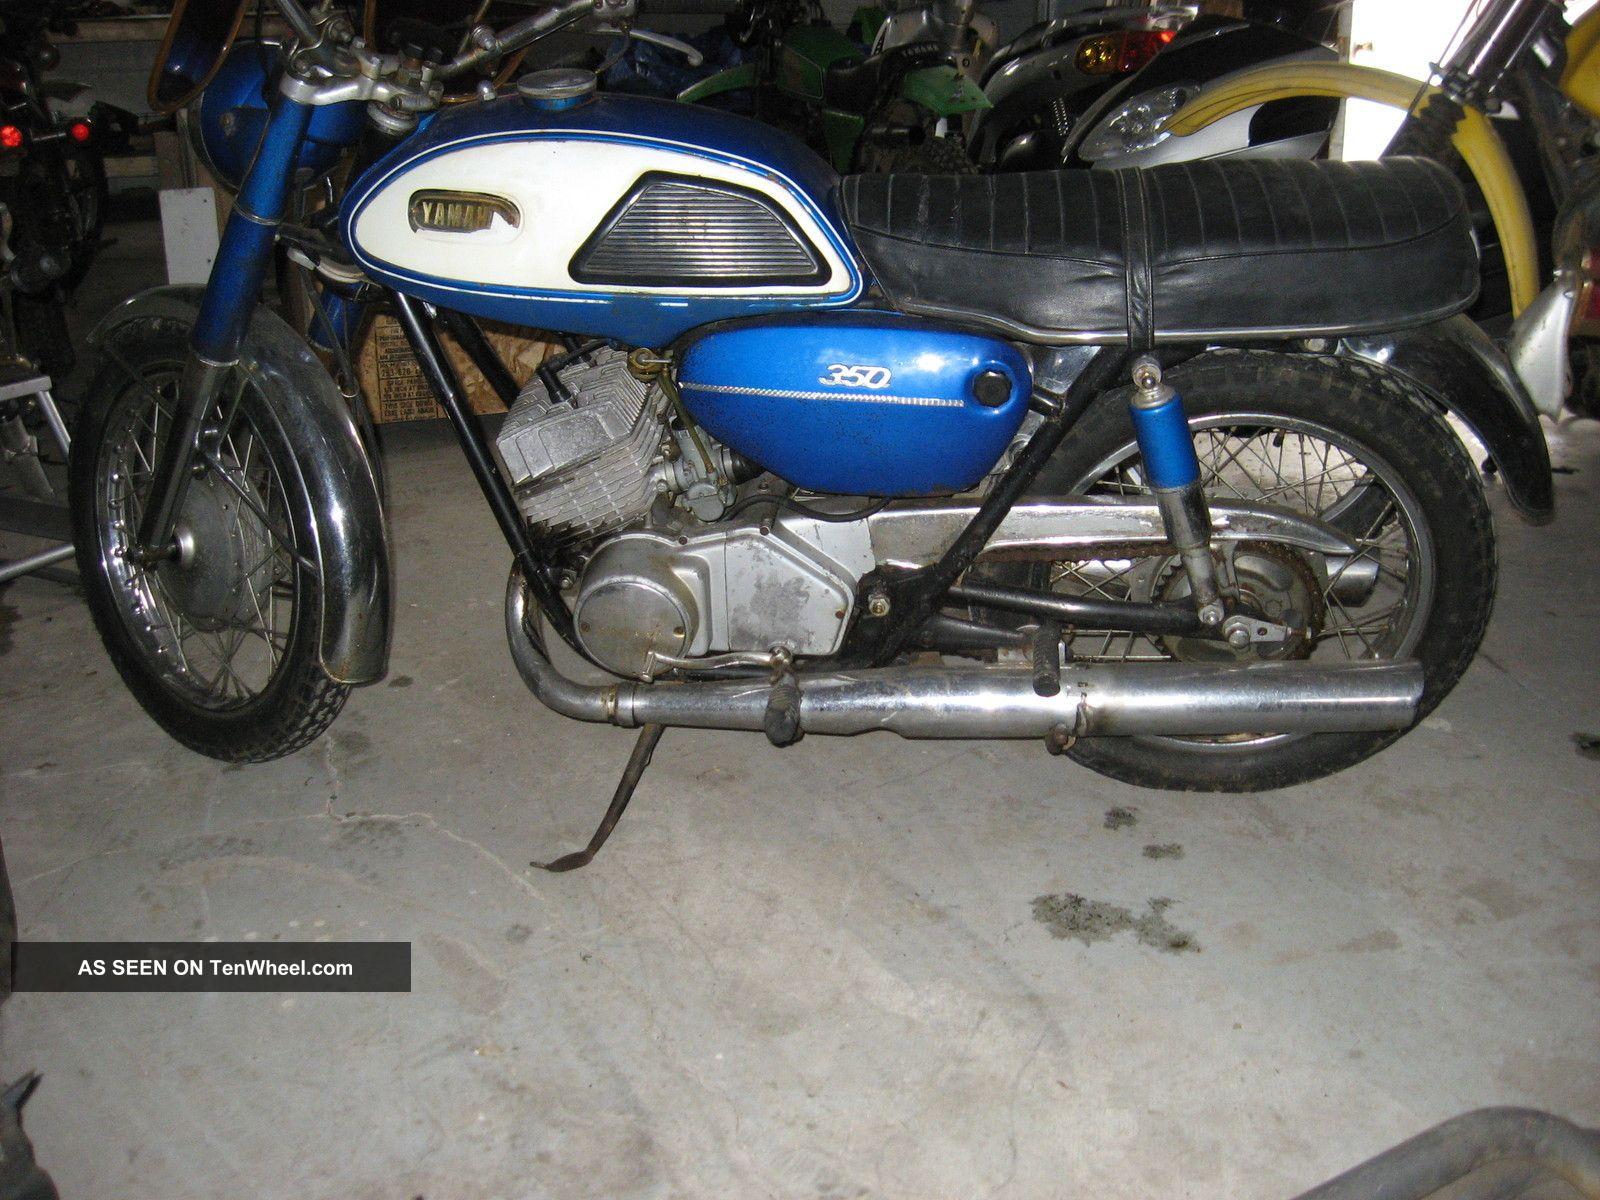 1968 Yamaha Yr2 350 Low Pipe 1967 Ya6 / Sb / R1 Other photo